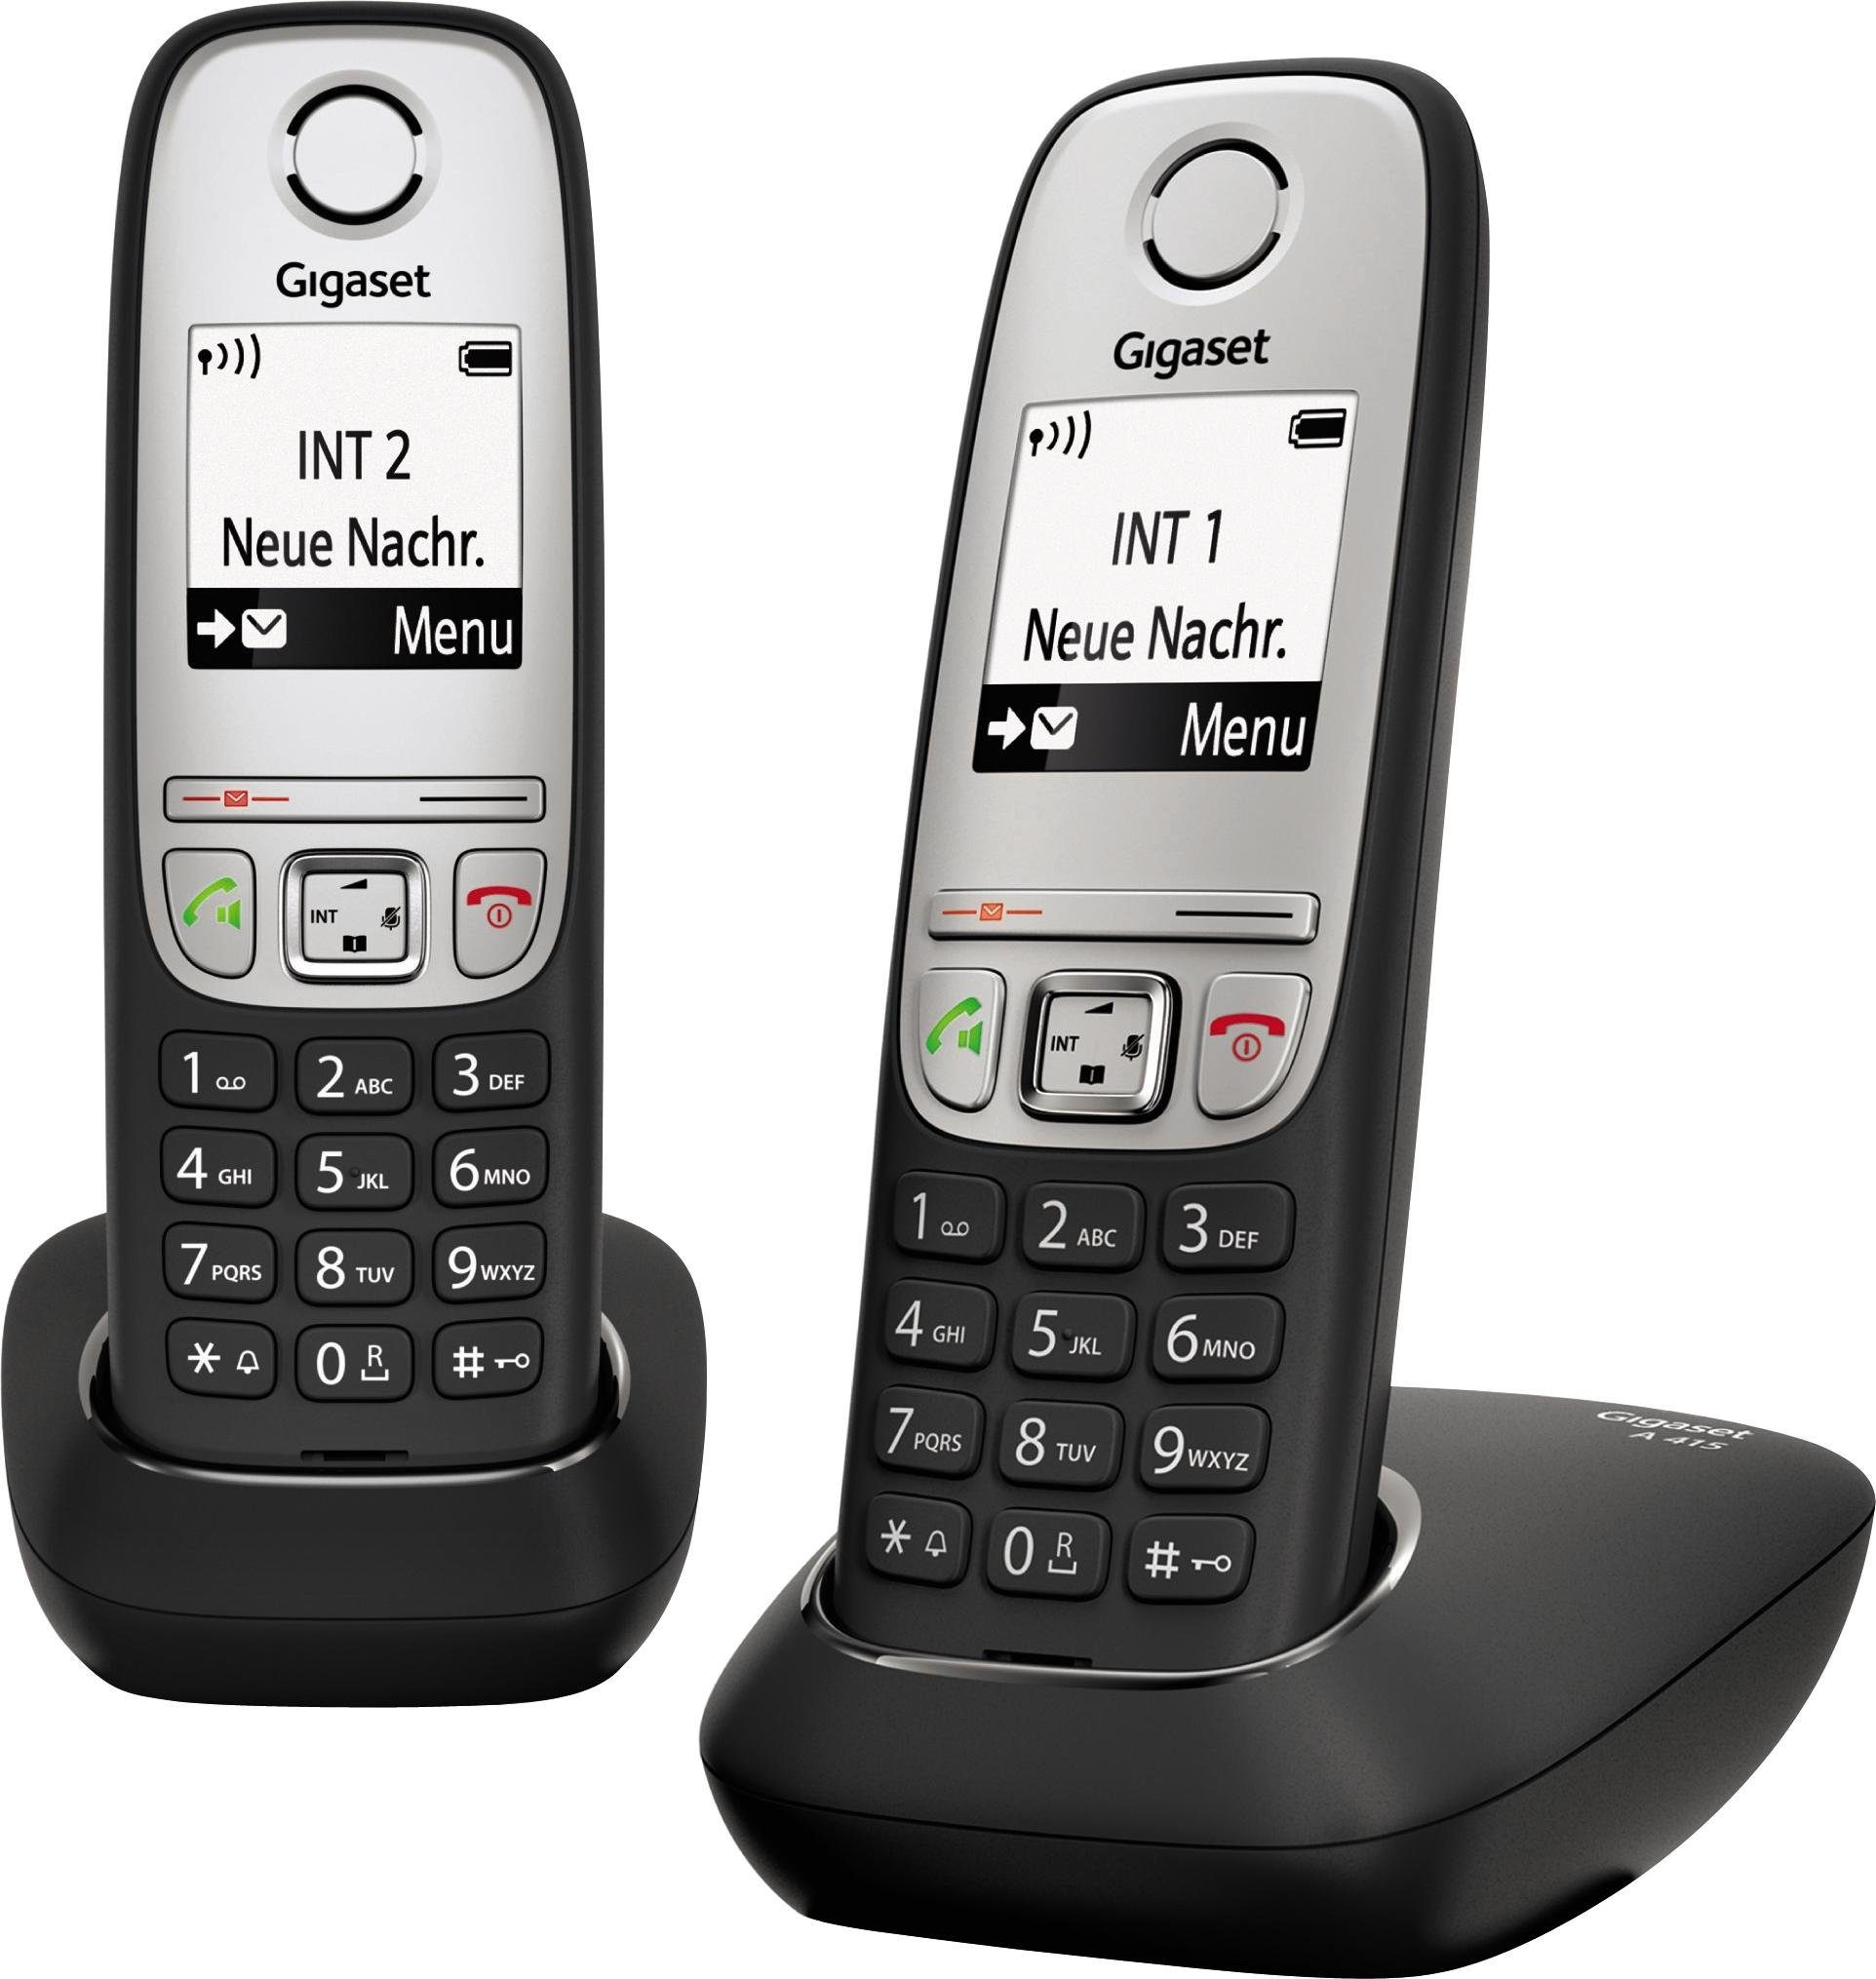 Gigaset A415 DUO Schnurloses DECT Telefon-Set